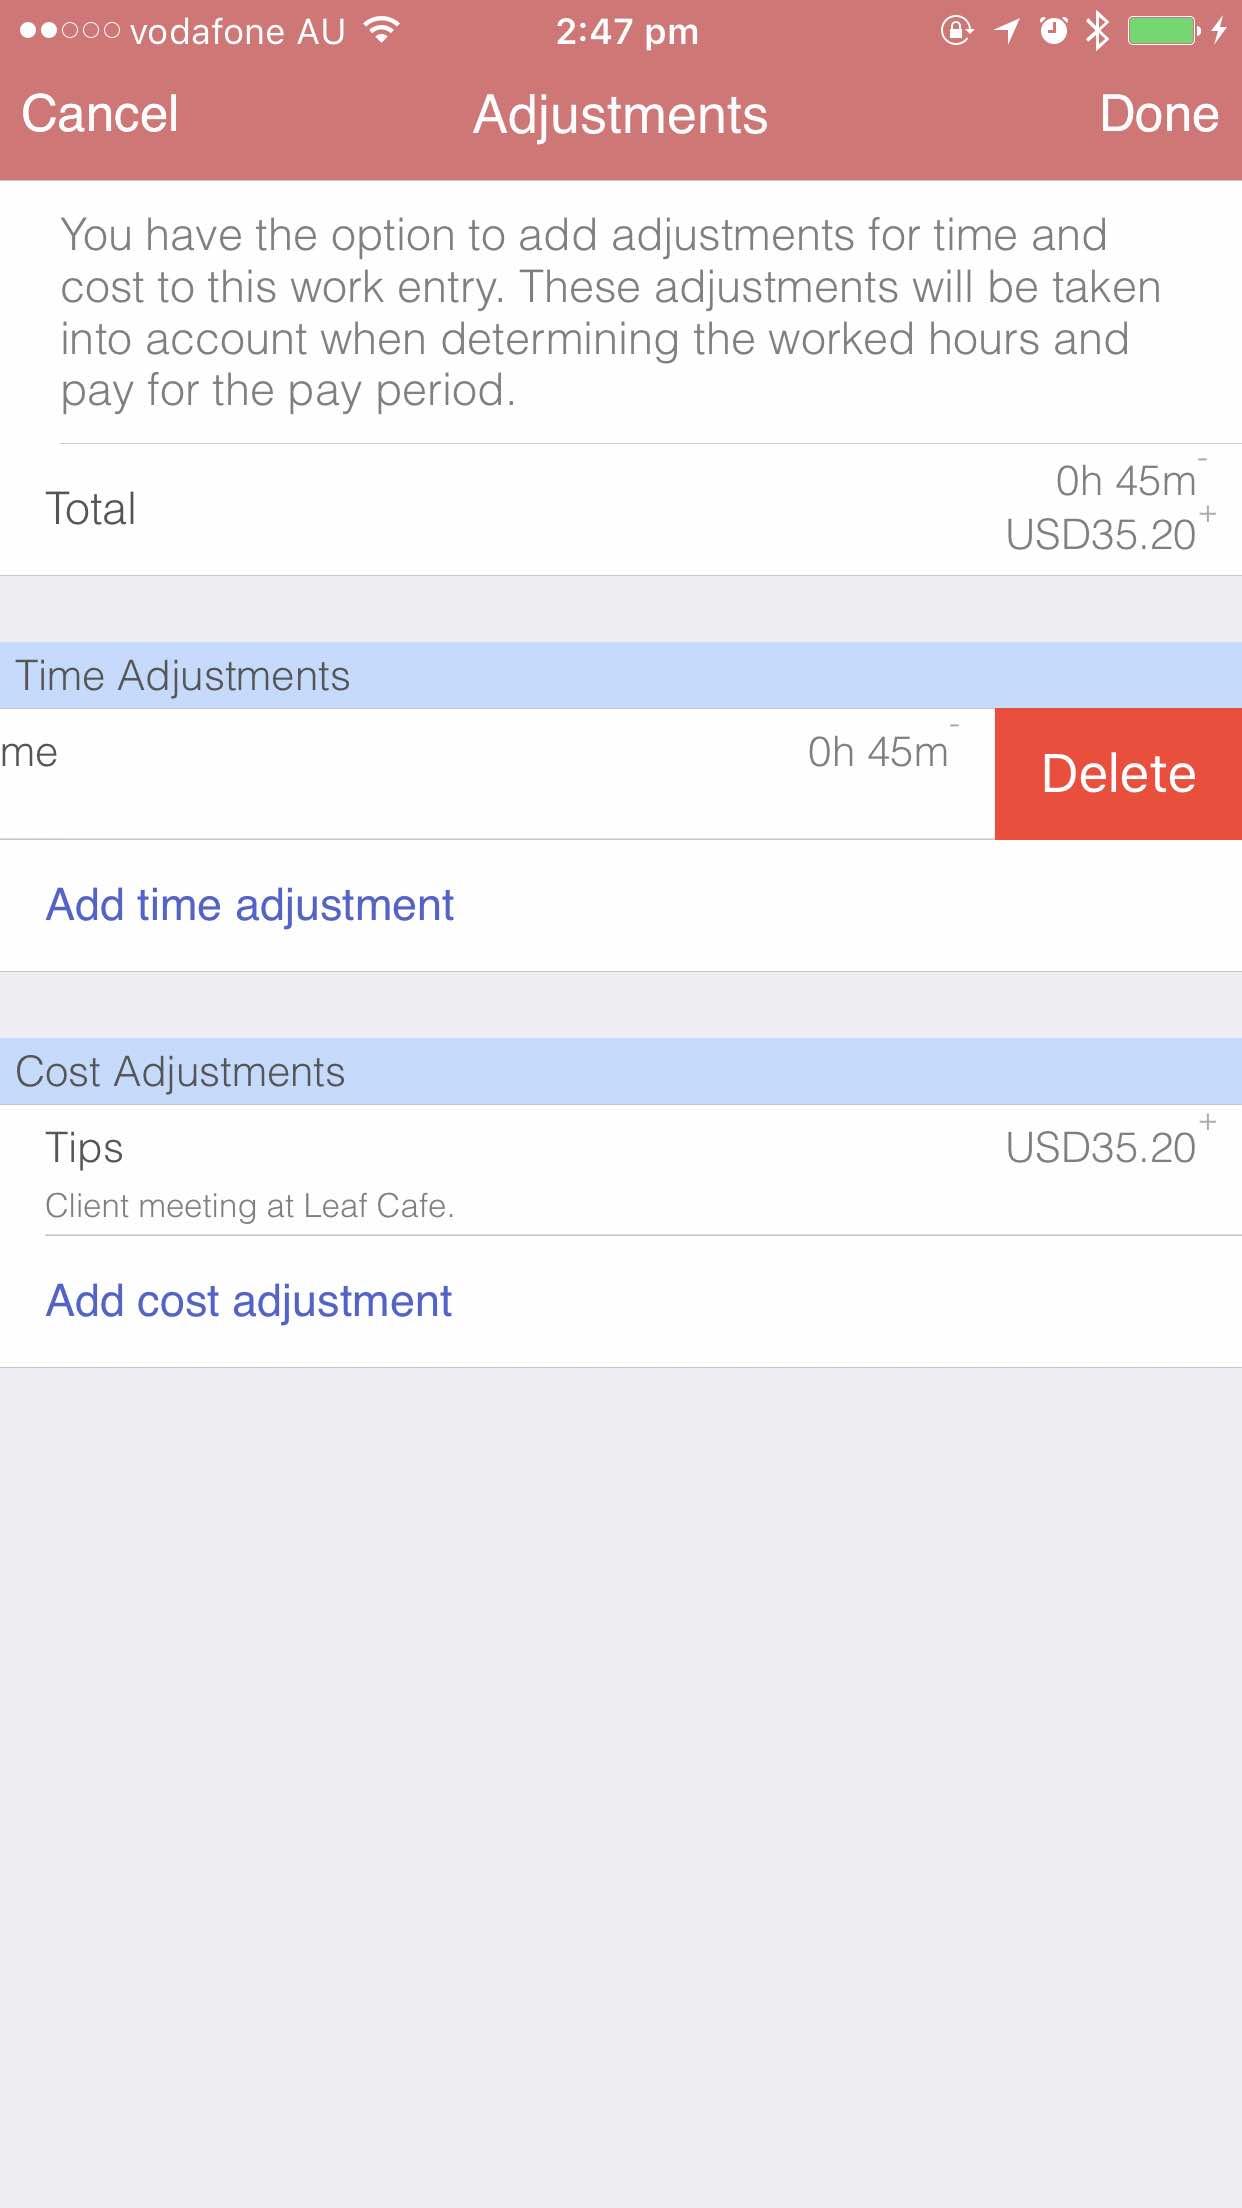 Deleting adjustments iOS